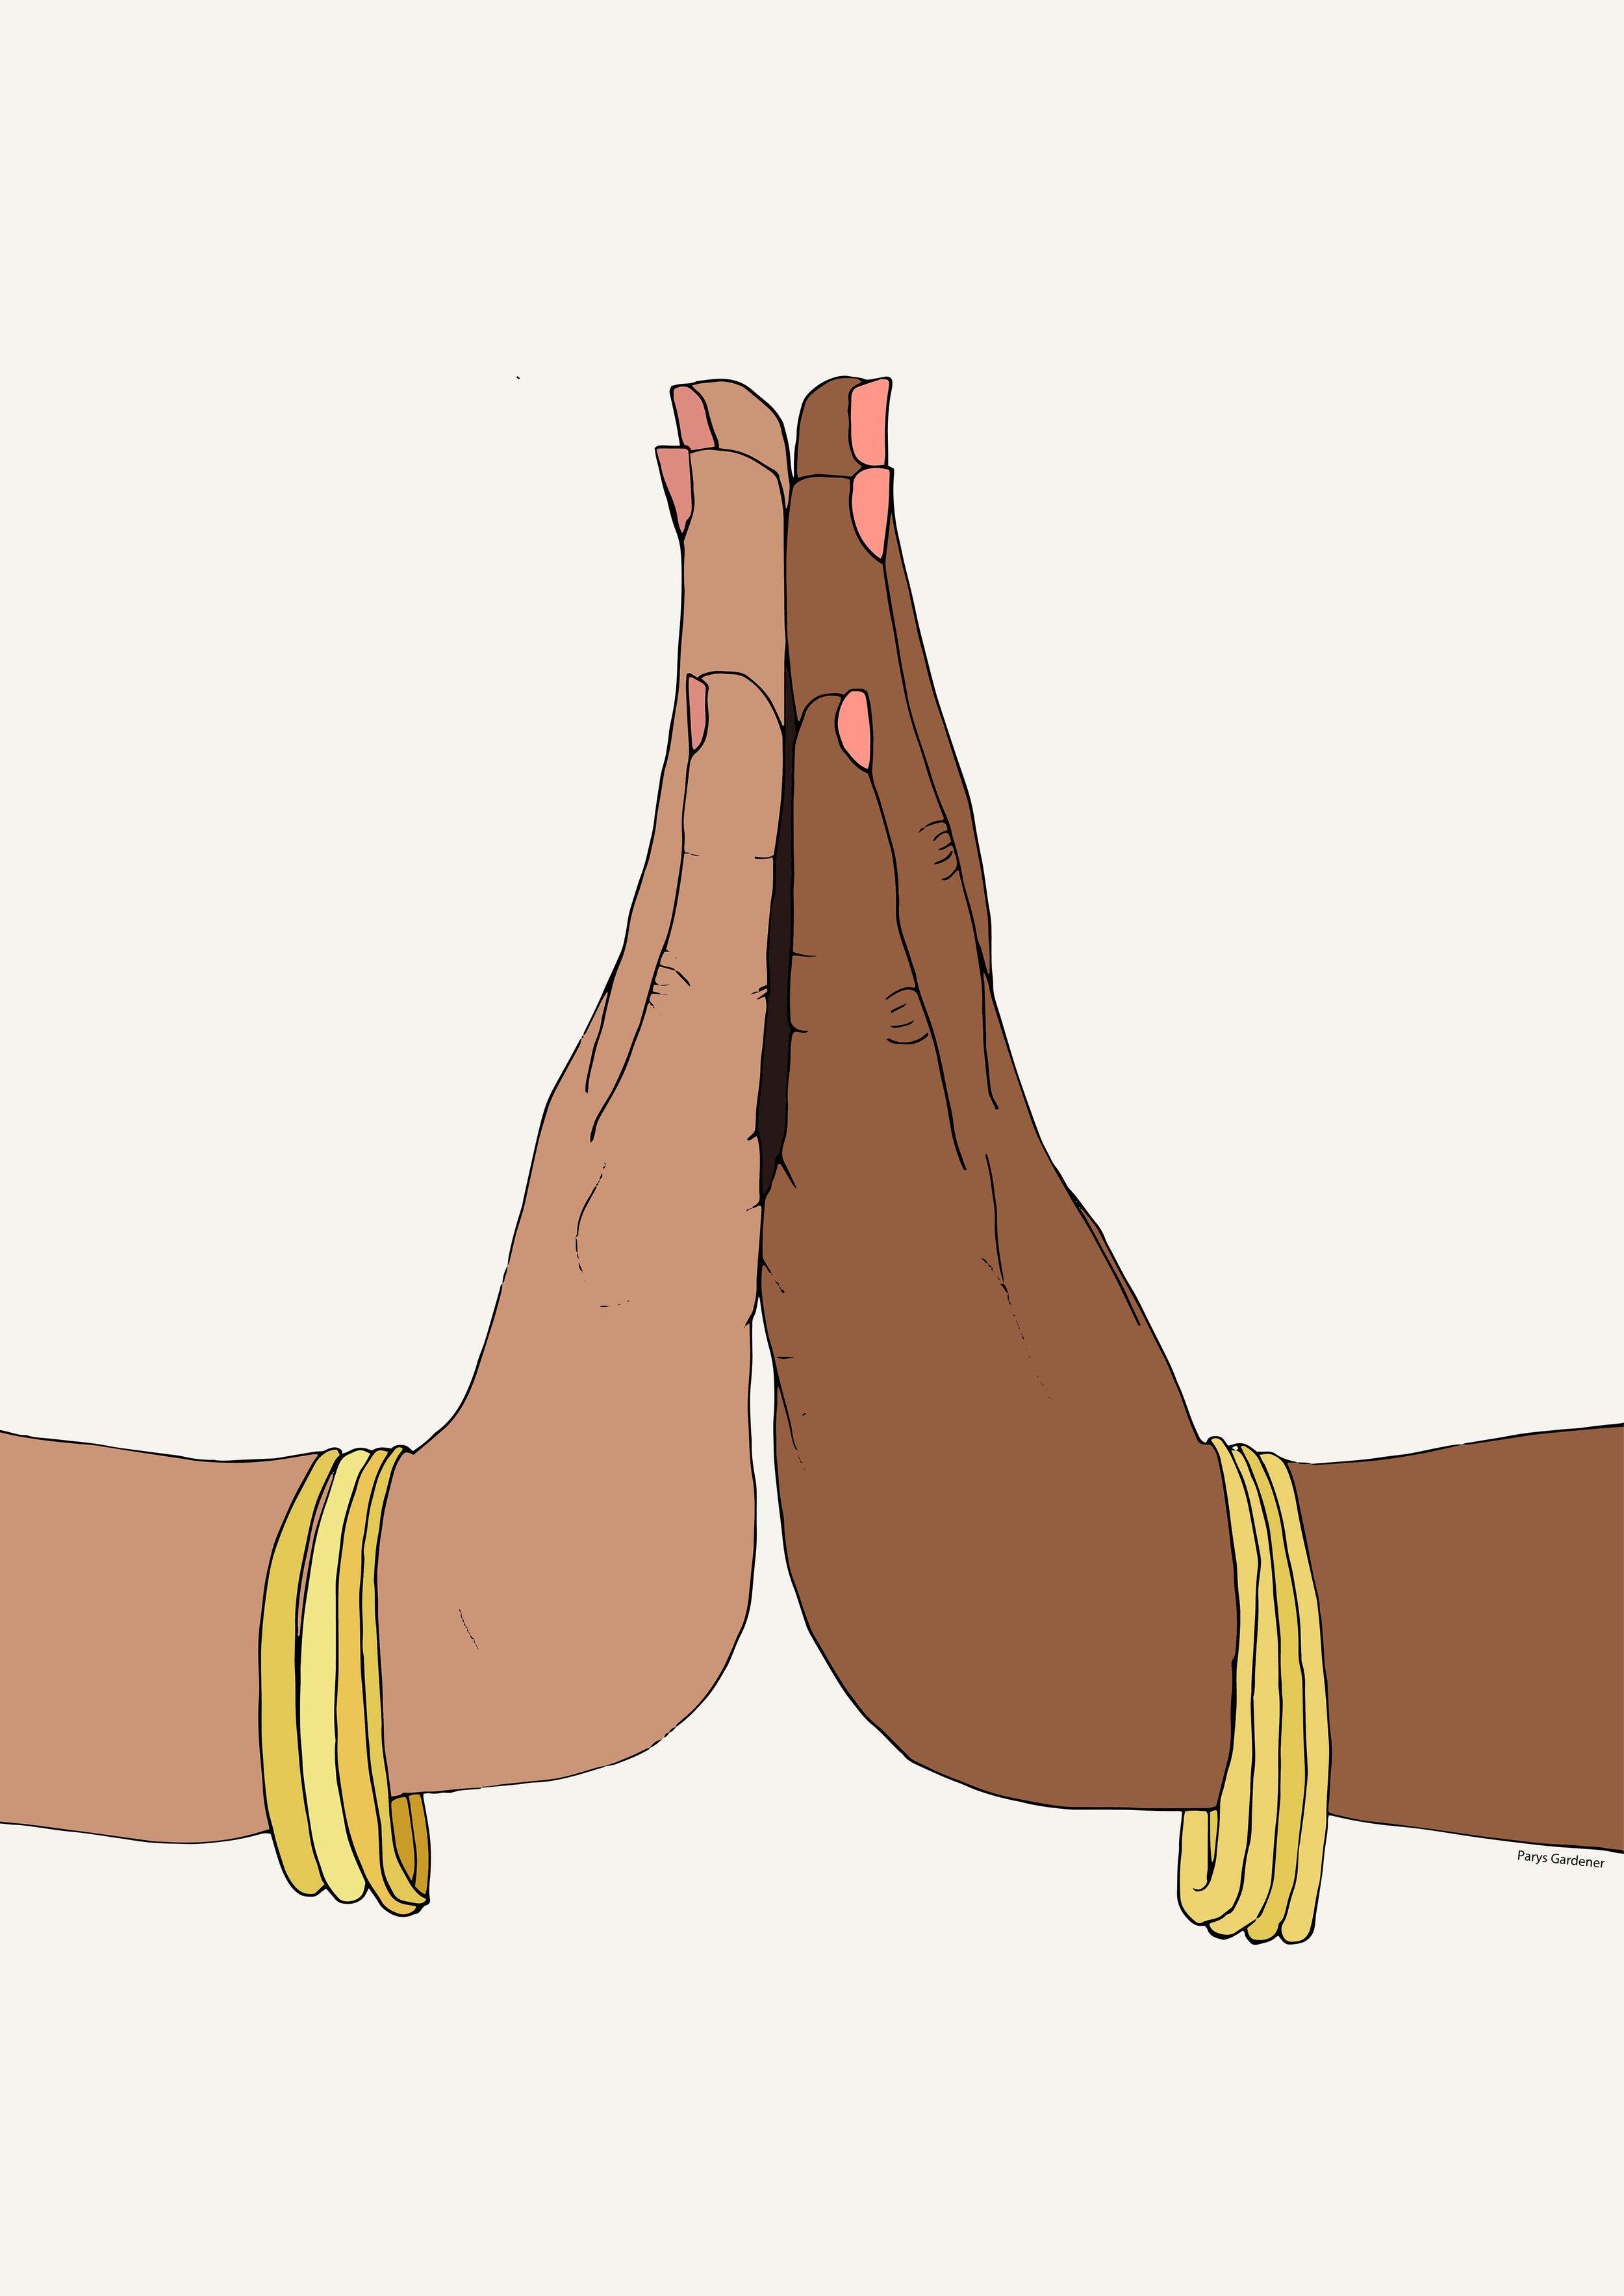 Healing Hands (Dismantling Colourism) parysgardener art  digital illustrator